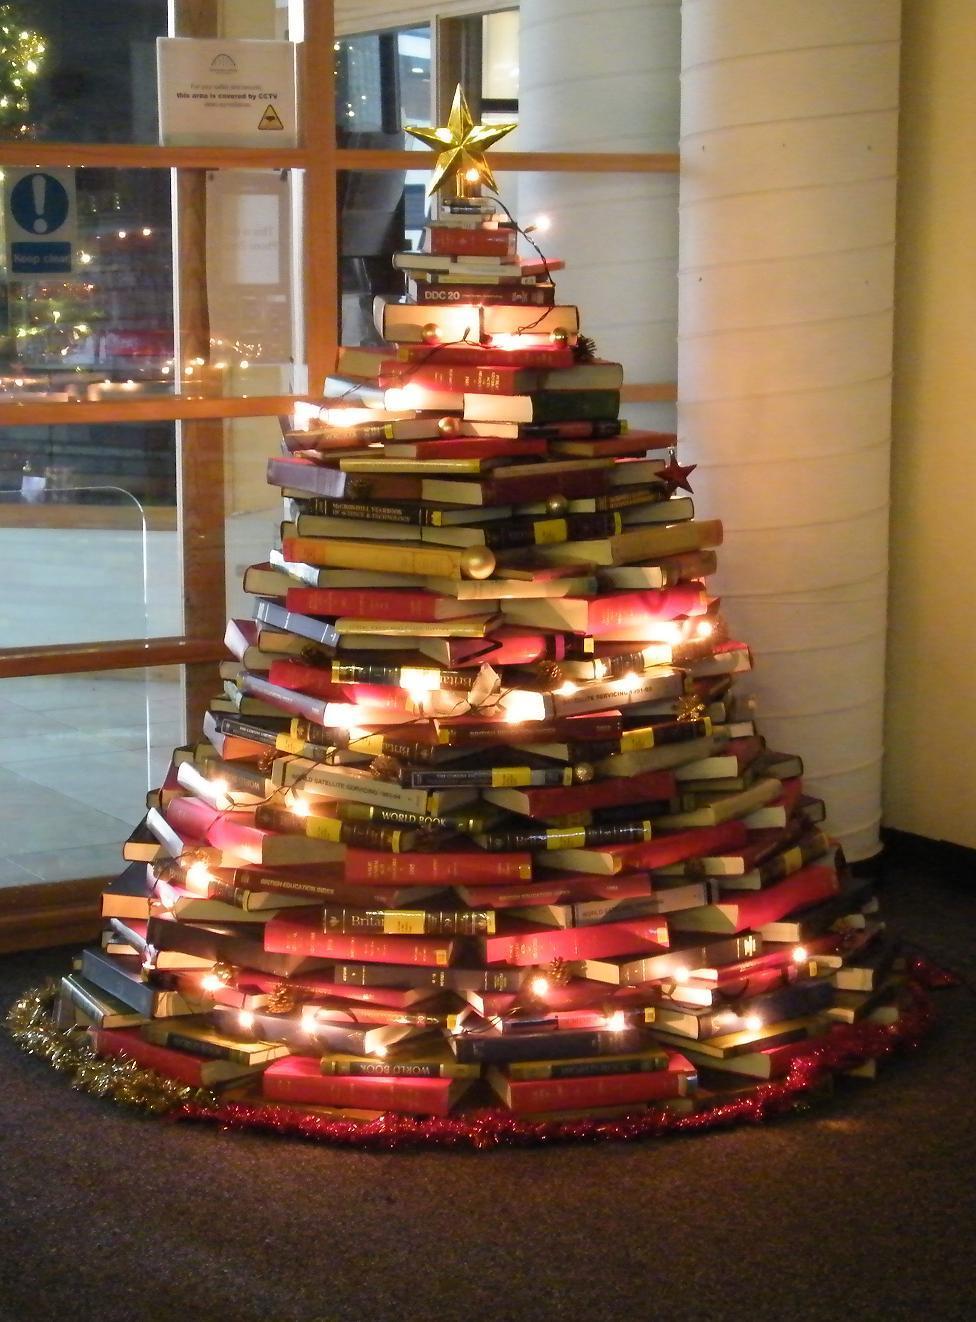 BOOK Christmas Tree Smaller